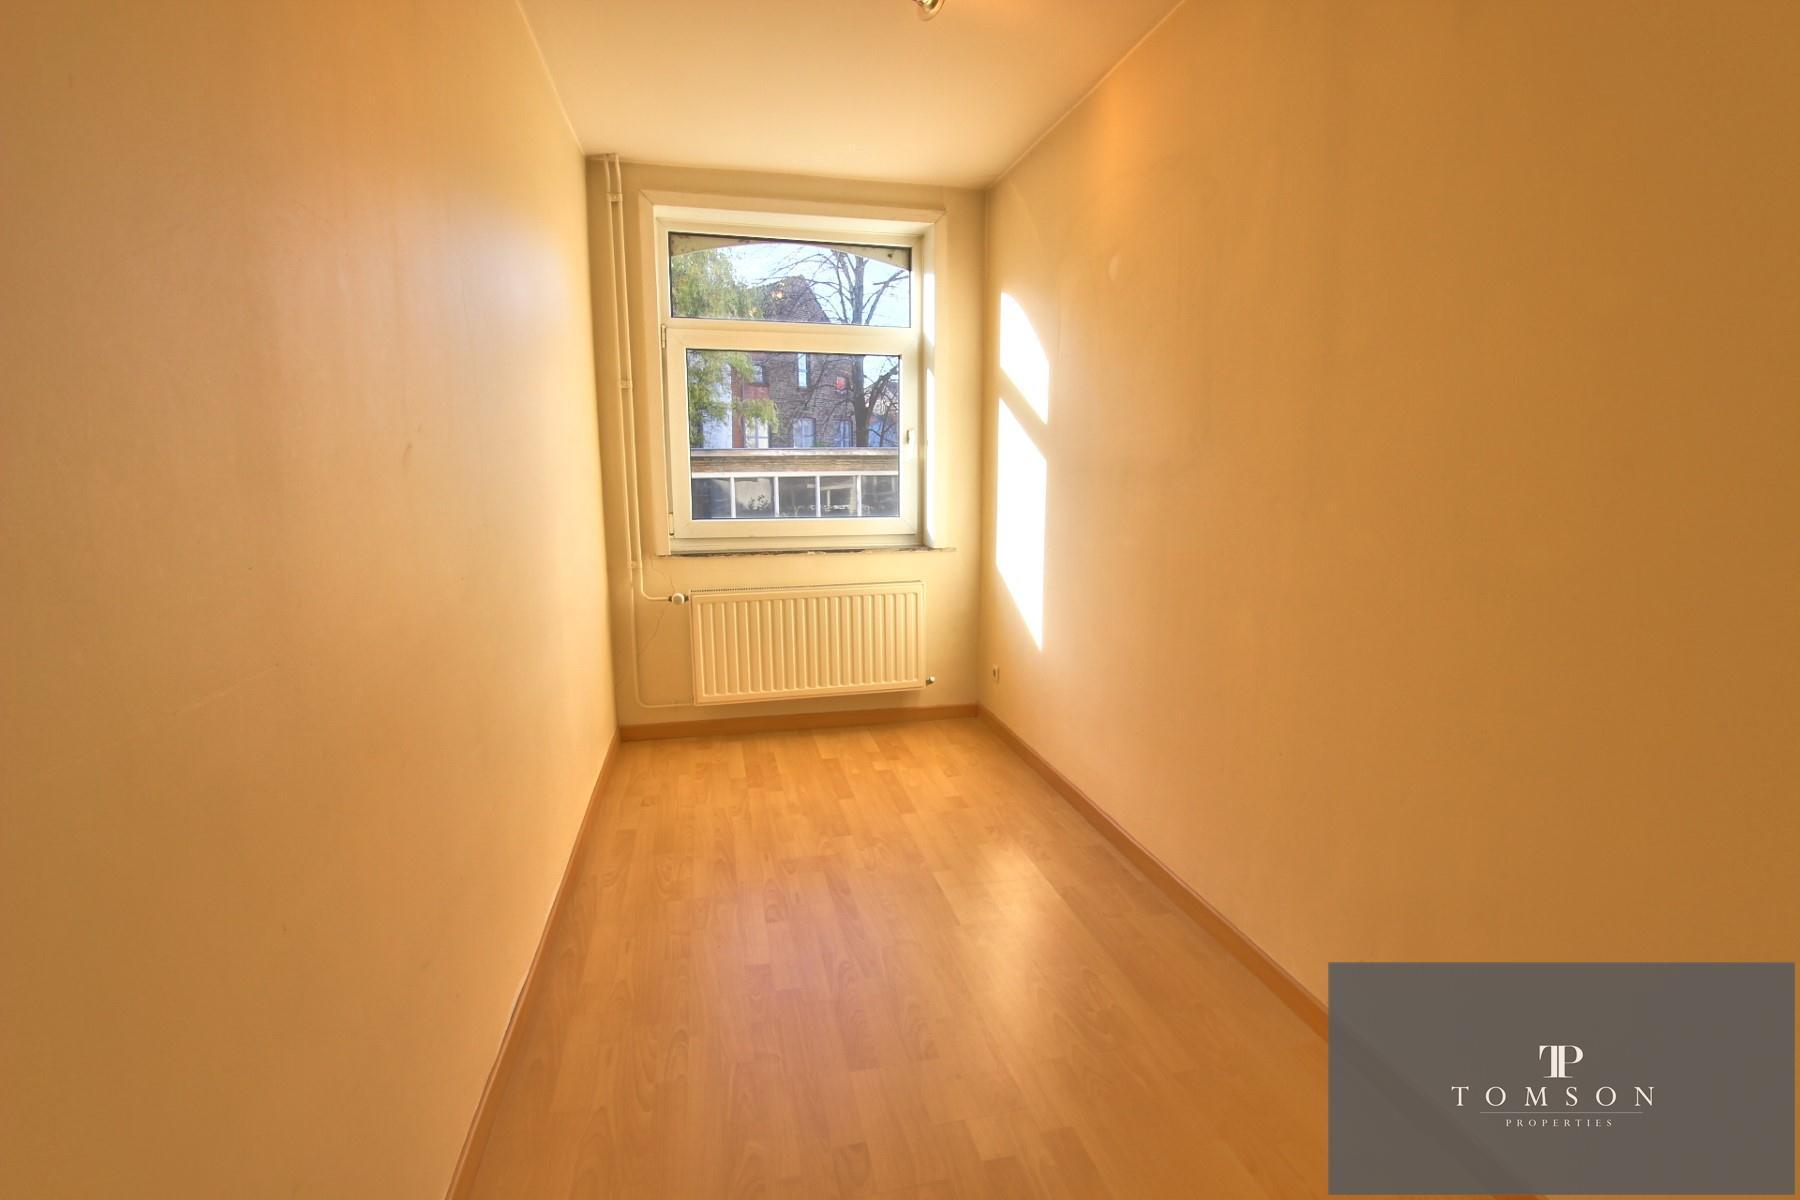 Flat - Etterbeek - #4130587-6